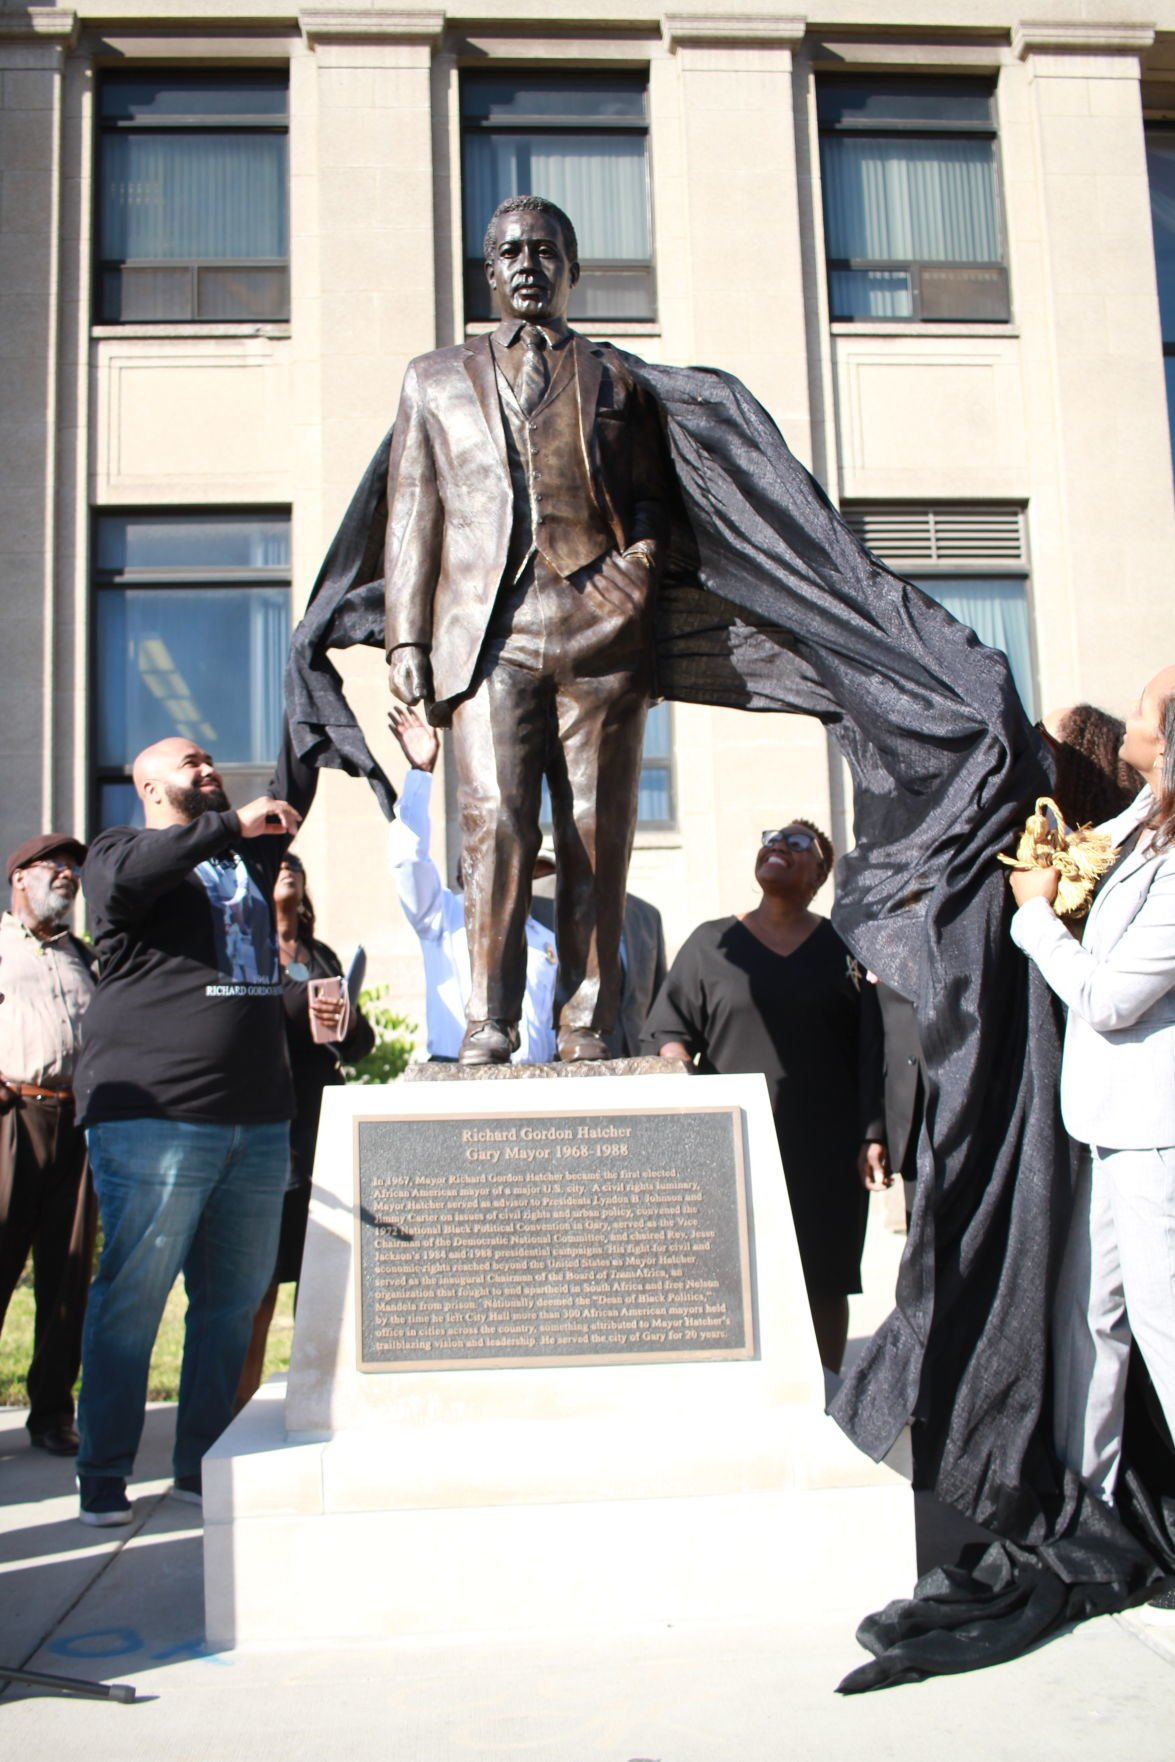 Hatcher statue unveiling